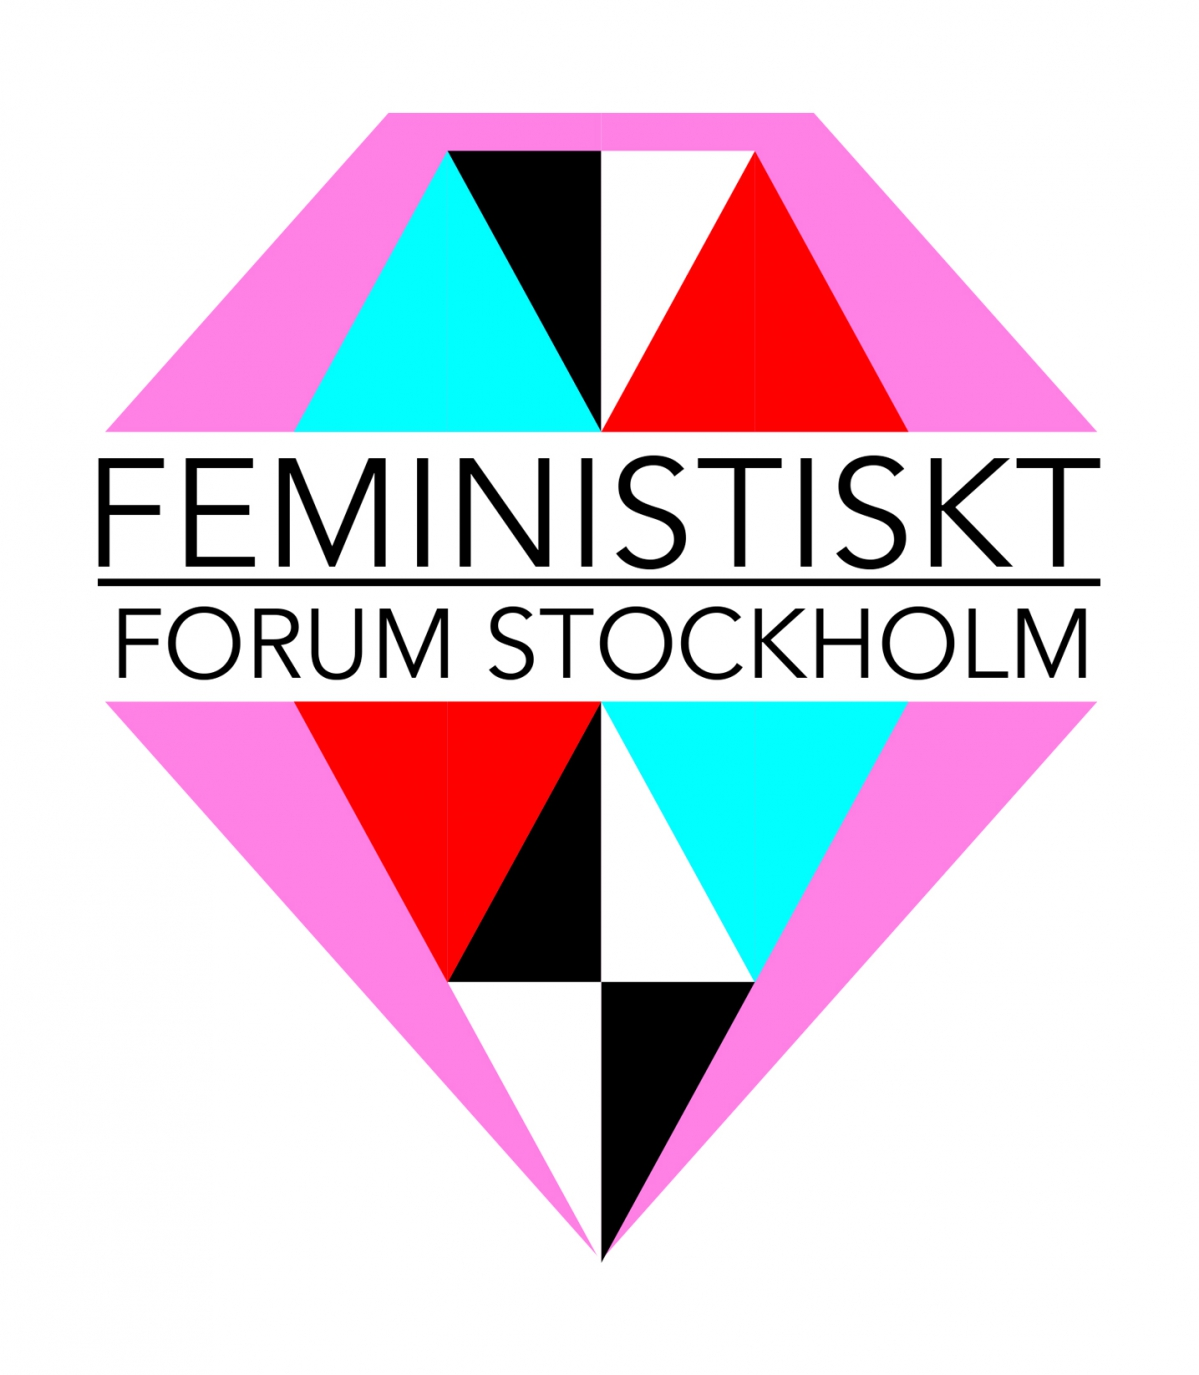 Posjet Stockholm feminist forumu